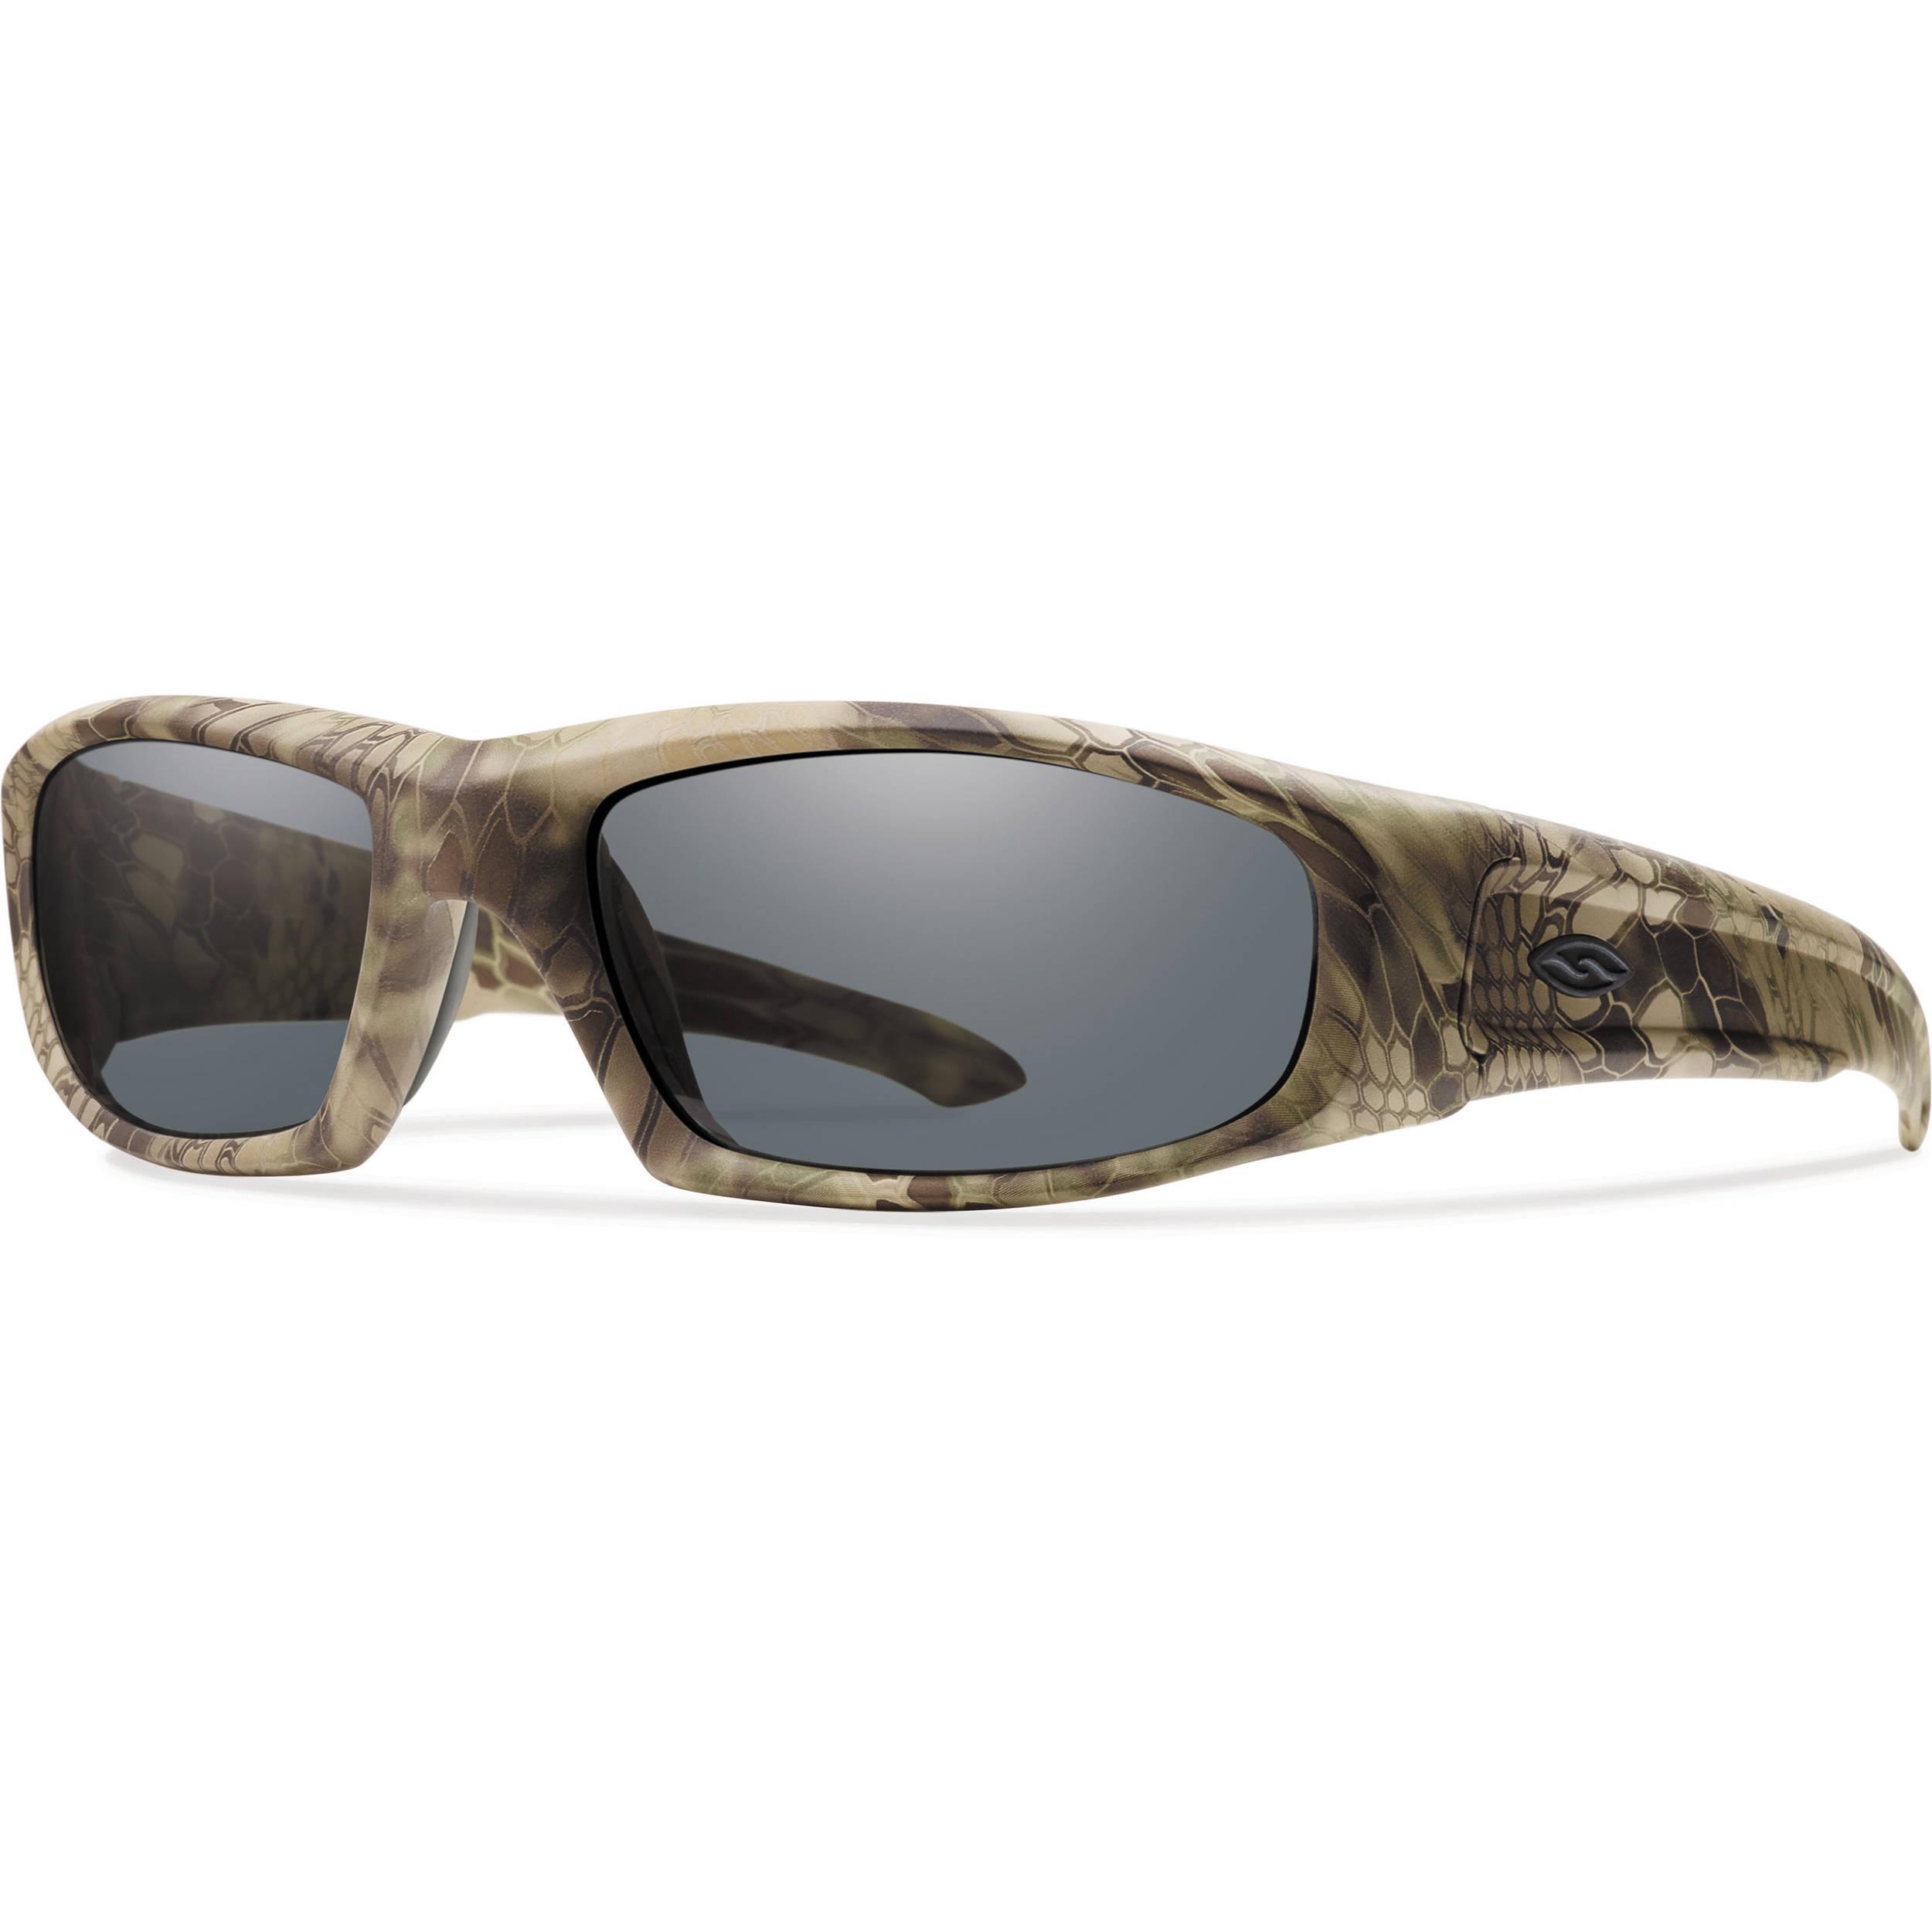 4ea5eea4bc Smith Optics Hudson Elite Tactical Sunglasses (Kryptek Highlander - Gray  Lens)